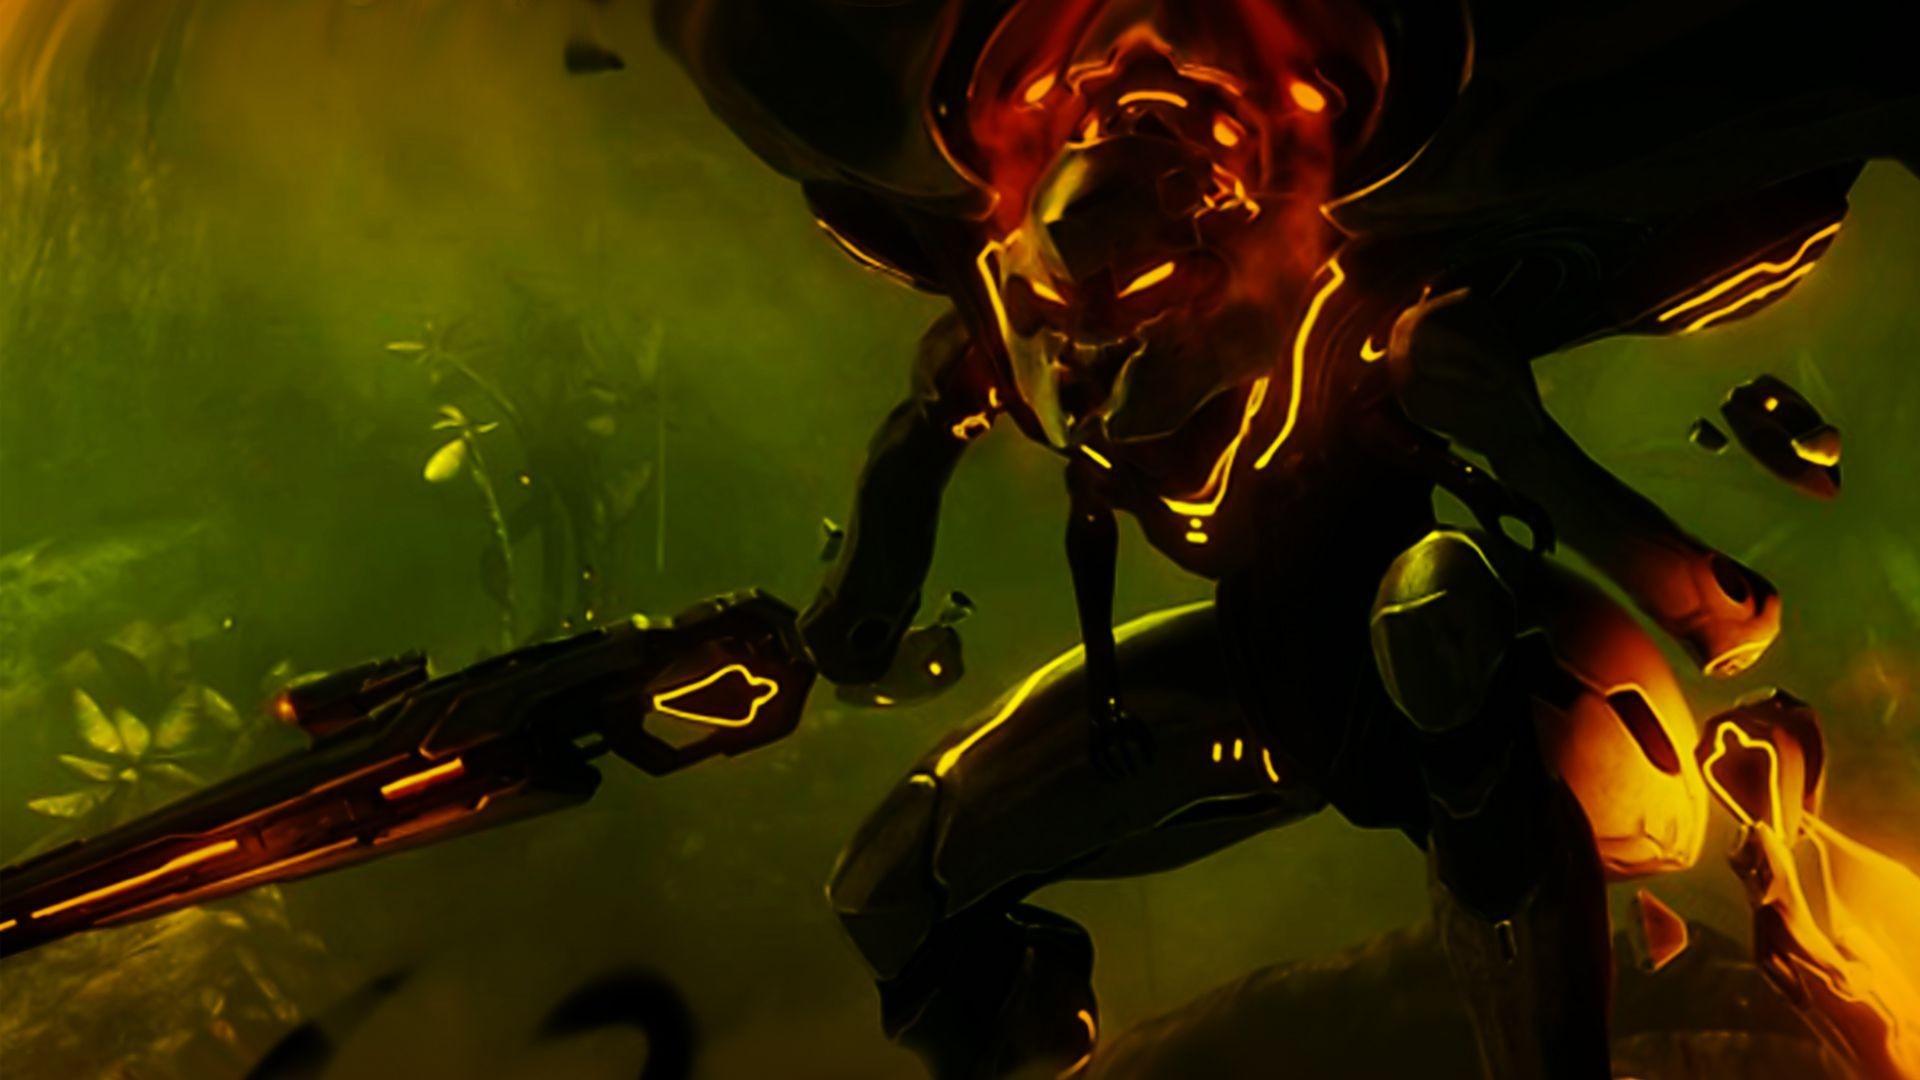 Halo 4 Full HD Wallpaper